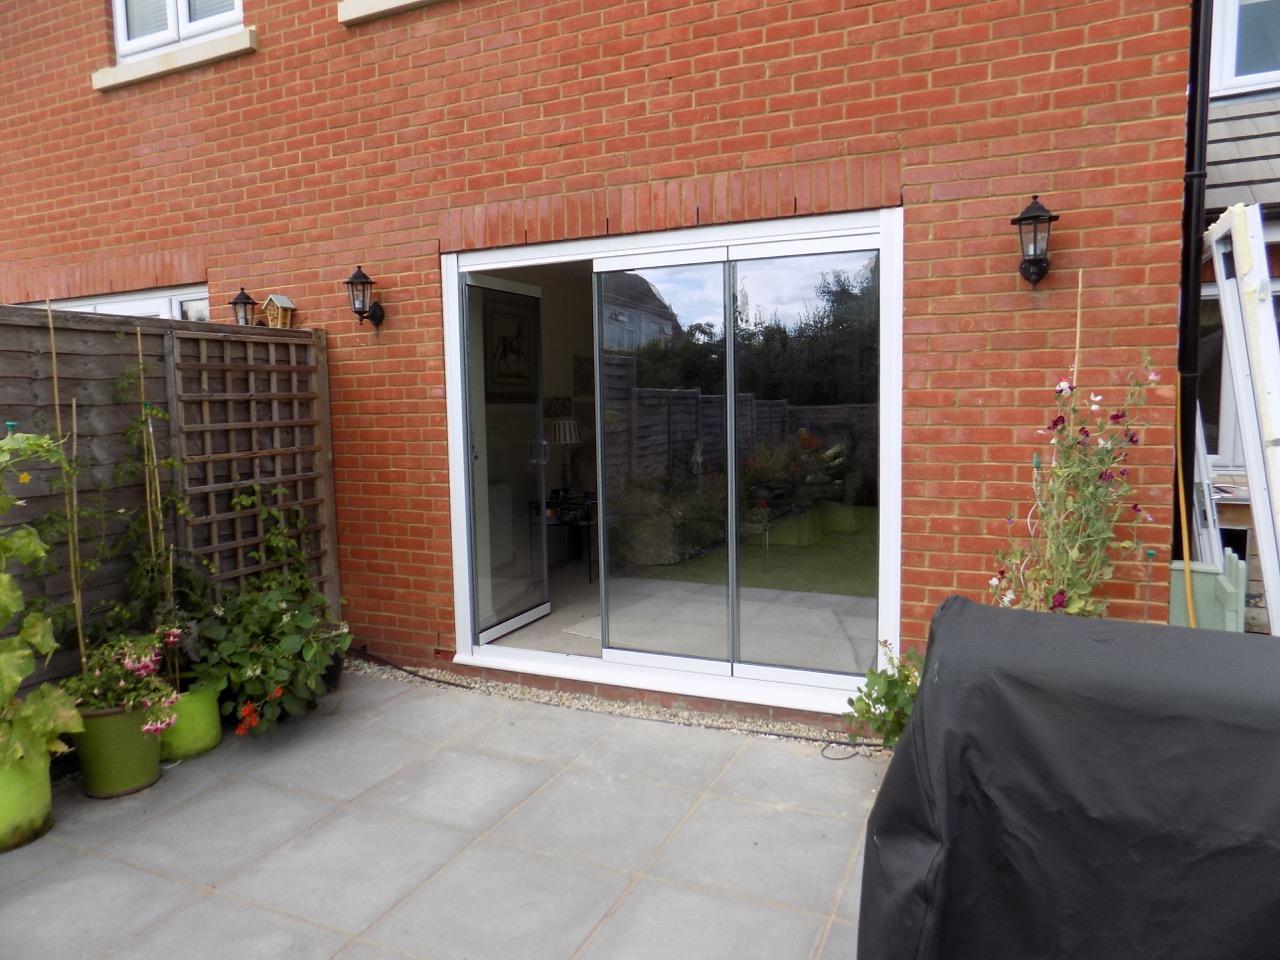 Causes of condensation on bifolding doors & windows